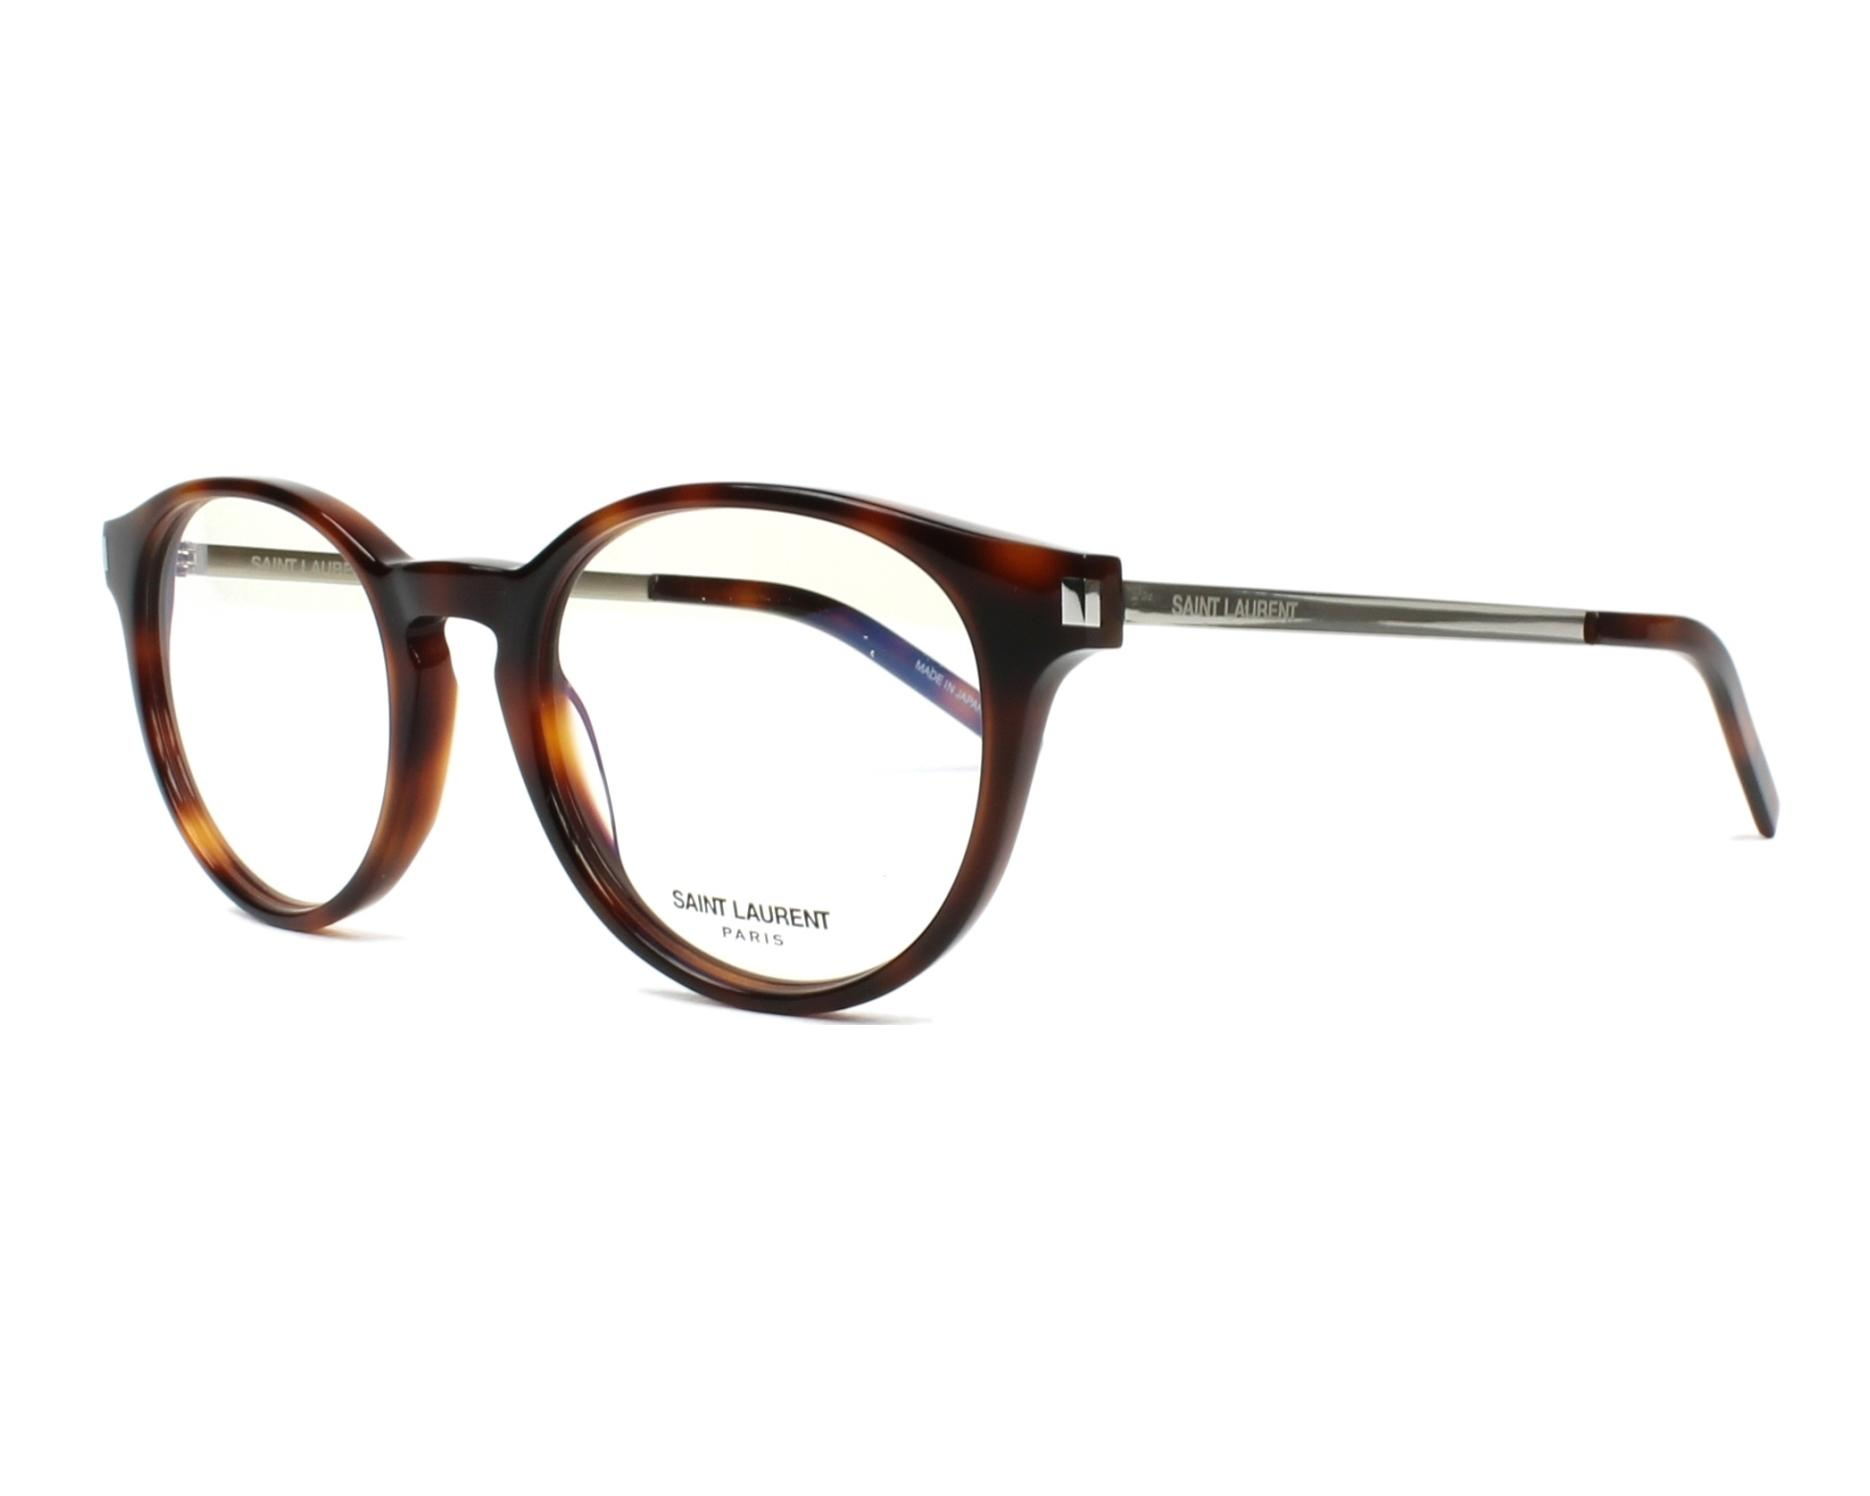 eyeglasses Yves Saint Laurent SL-25 002 49-19 Havana Silver profile view c5f30aa1493f